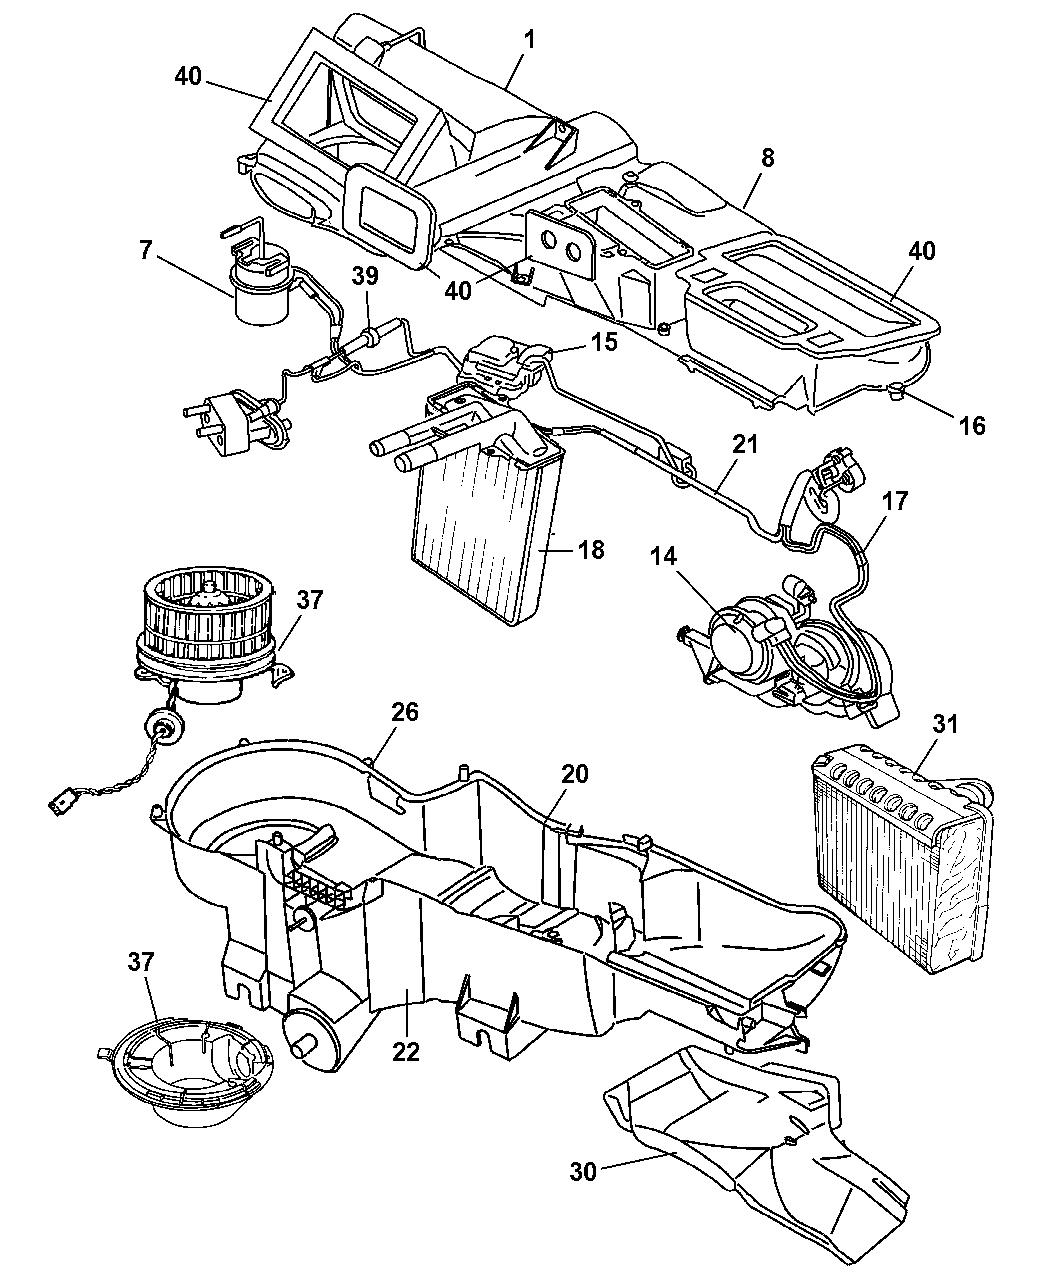 5066552aa genuine mopar resistor a c heater jeep liberty door diagram jeep liberty heater diagram #4